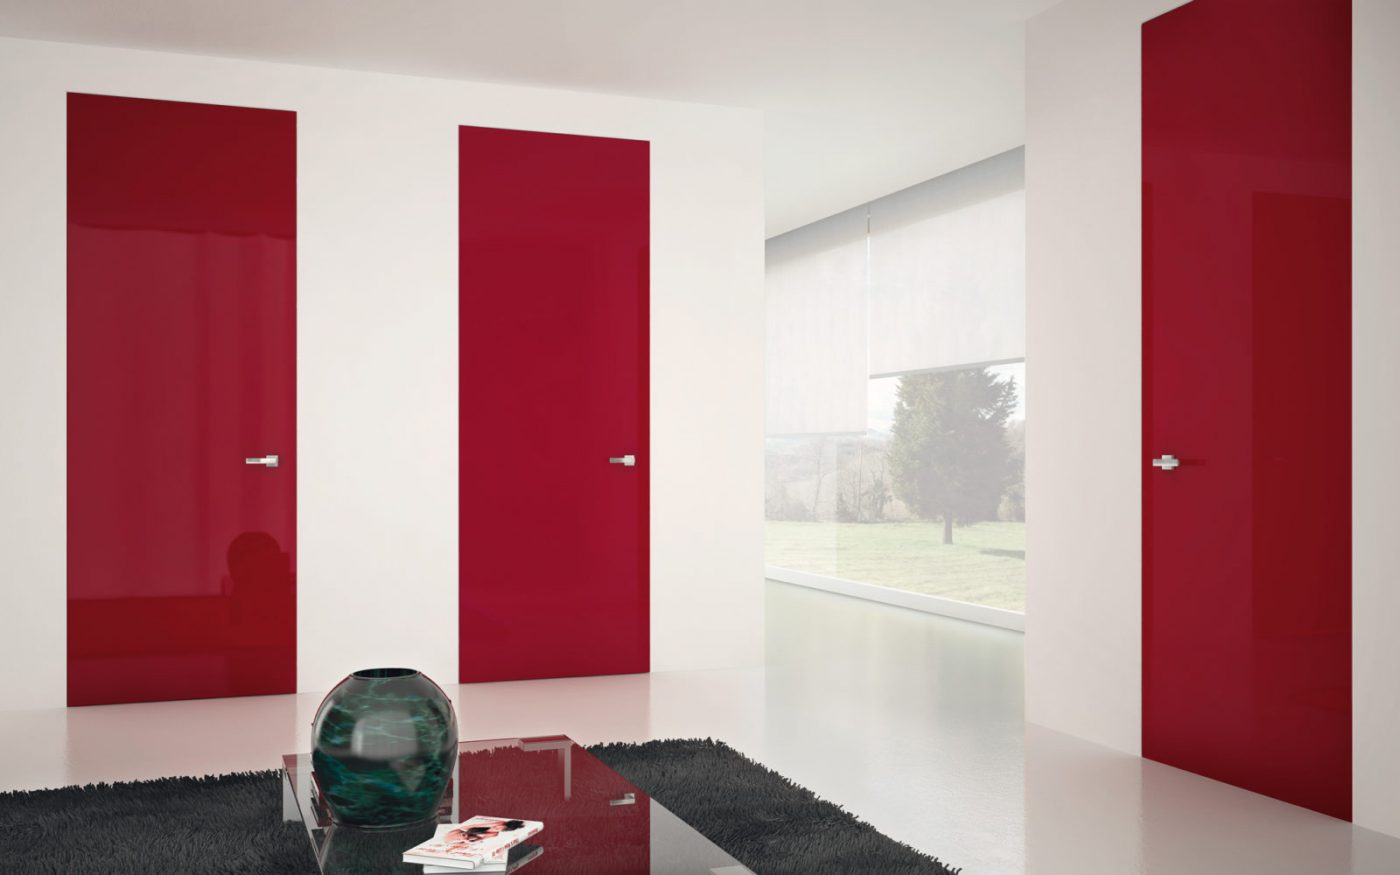 Porte rosse a filo muro - Gidea